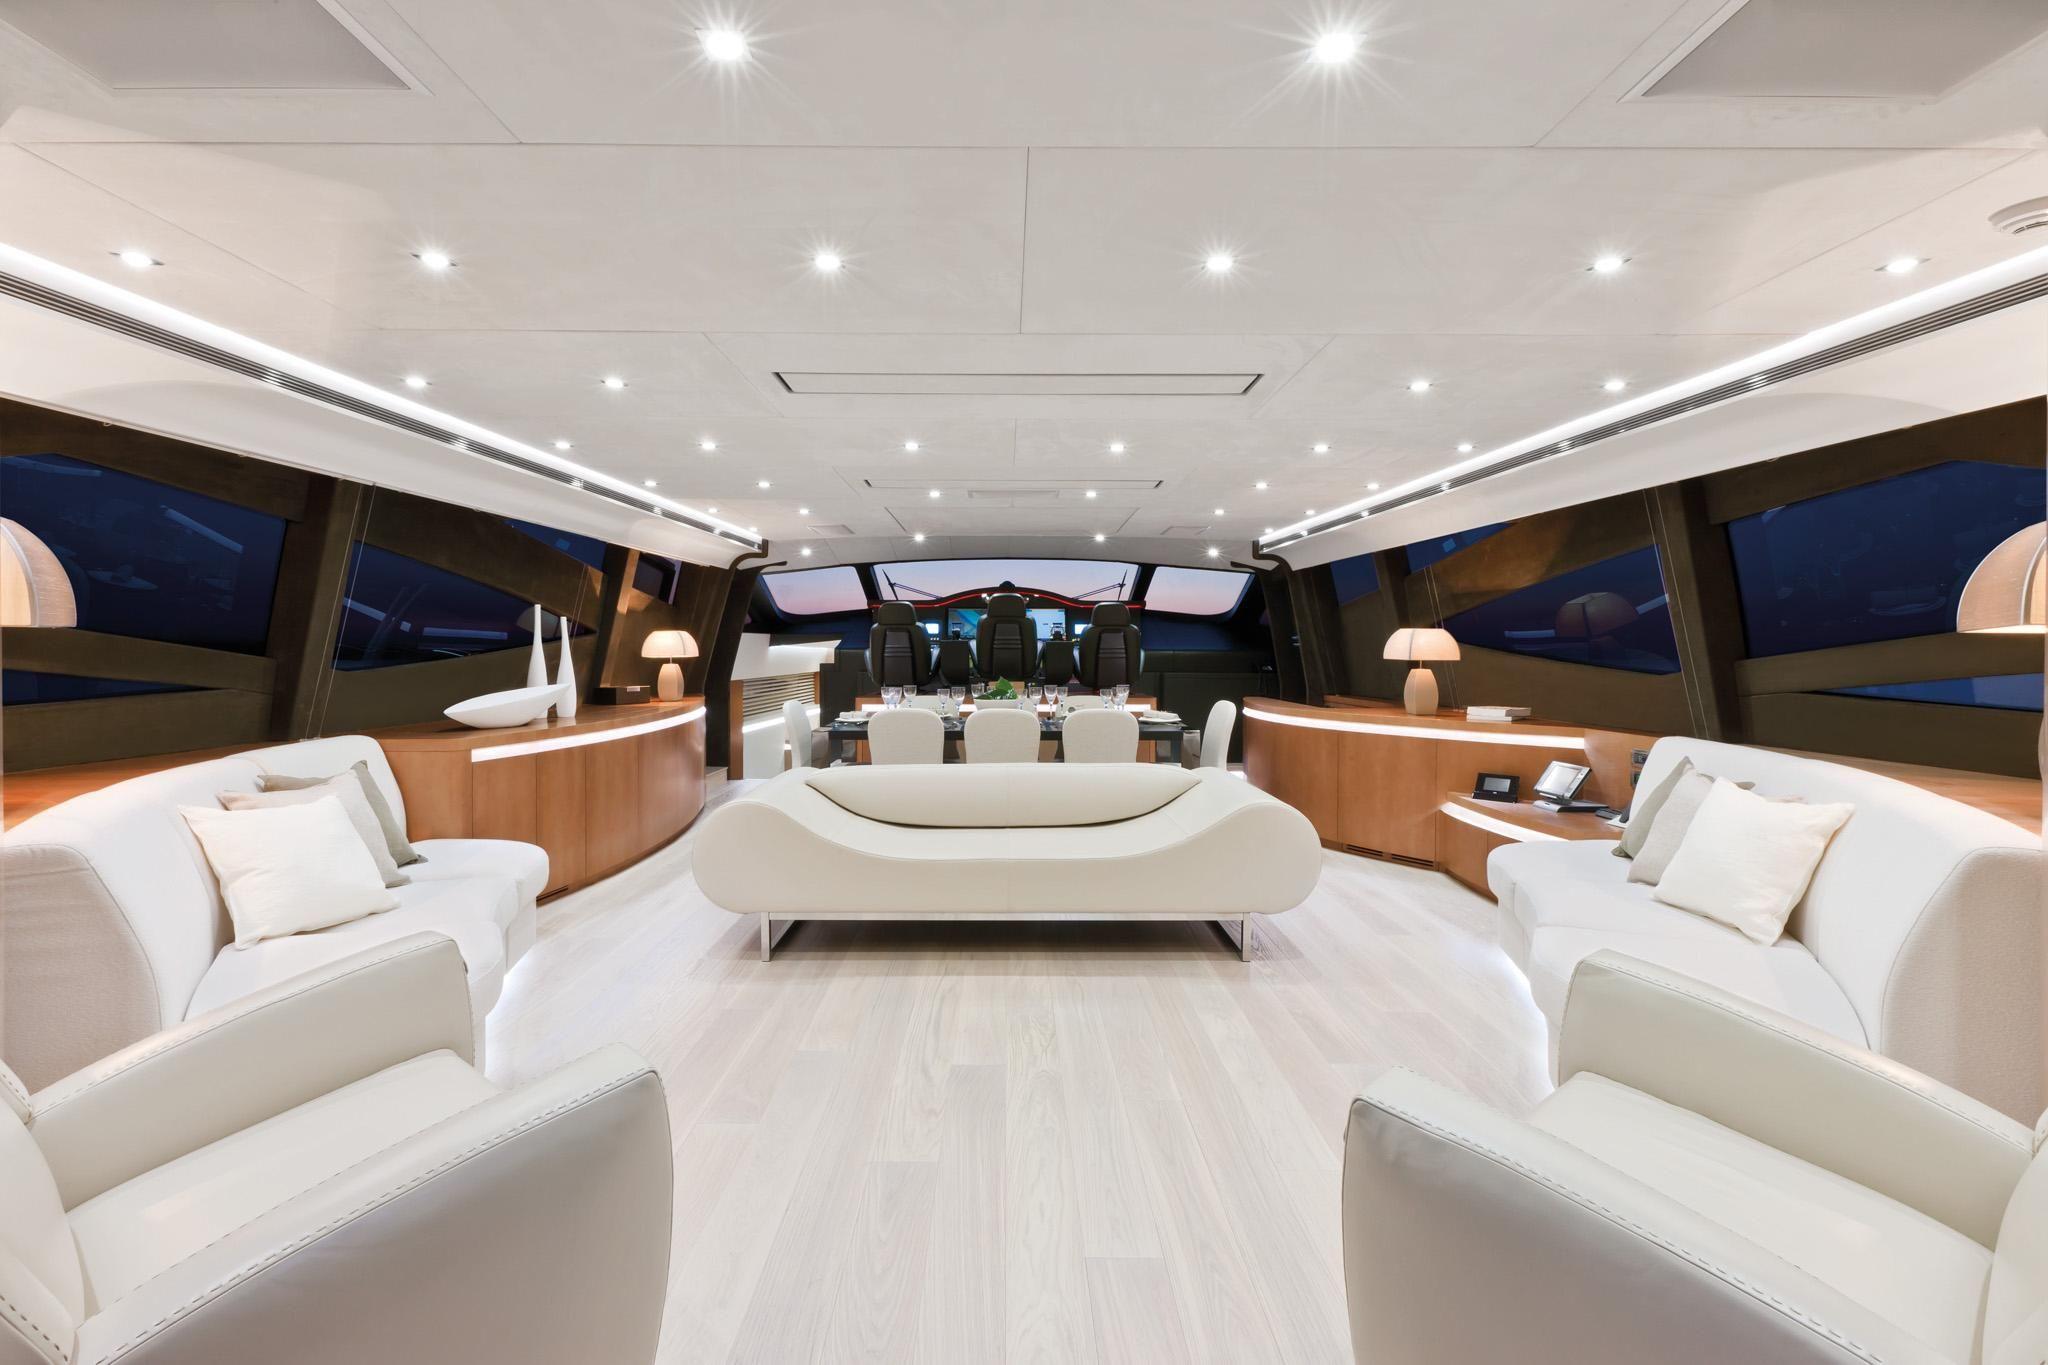 Luxury superyacht keyla interior by hot lab luxury yacht charter - Internal View Pershing Yacht Pershing 115 Motor Yachtsyacht Interiorthe Yachtsuper Yachtsyacht Designluxury